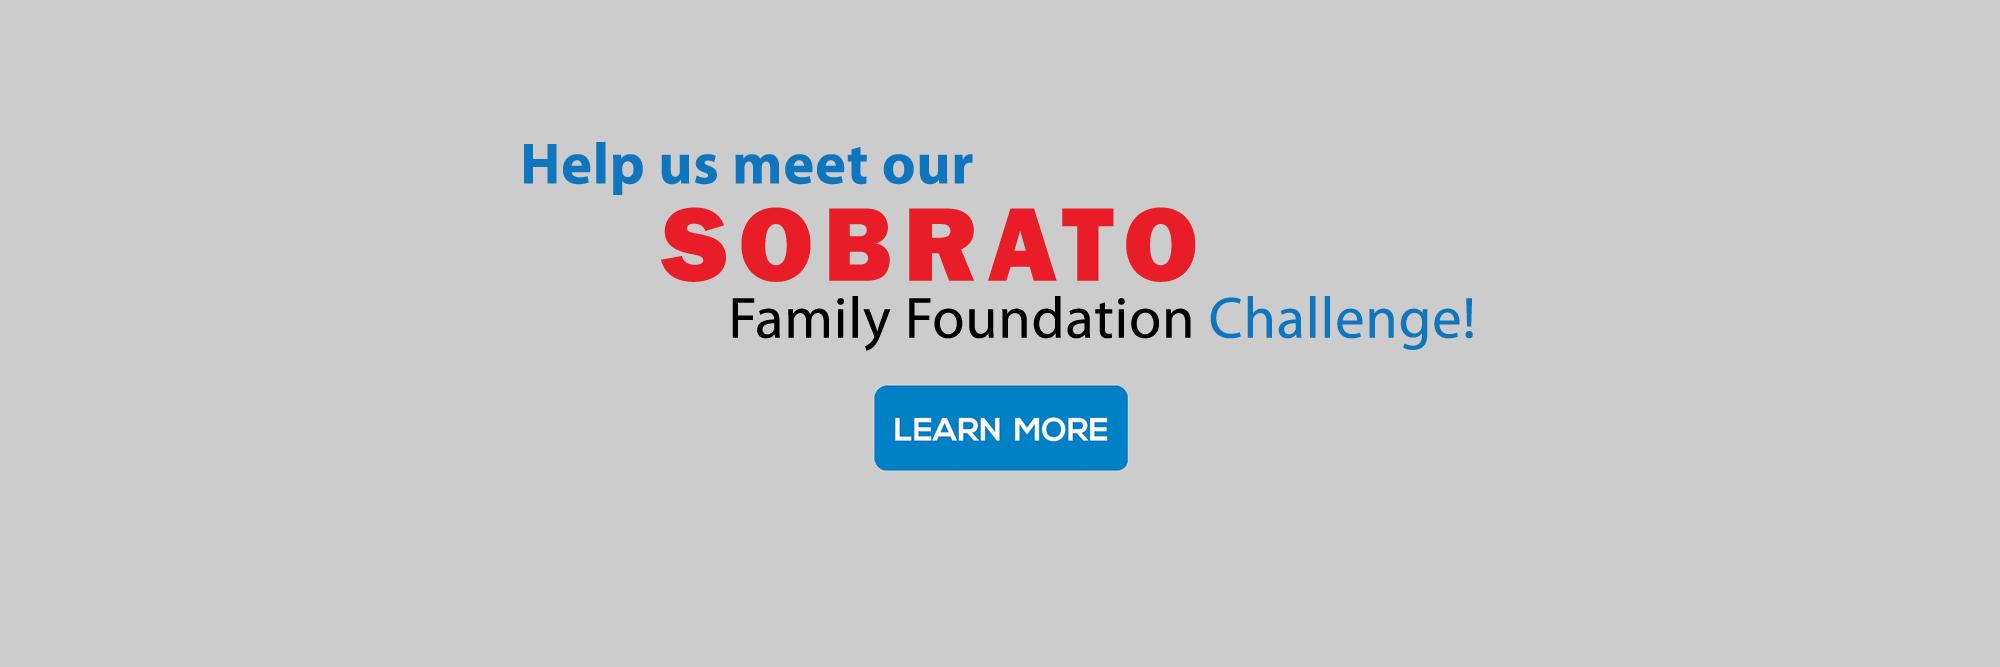 Take the Sobrato Family Foundation Challenge